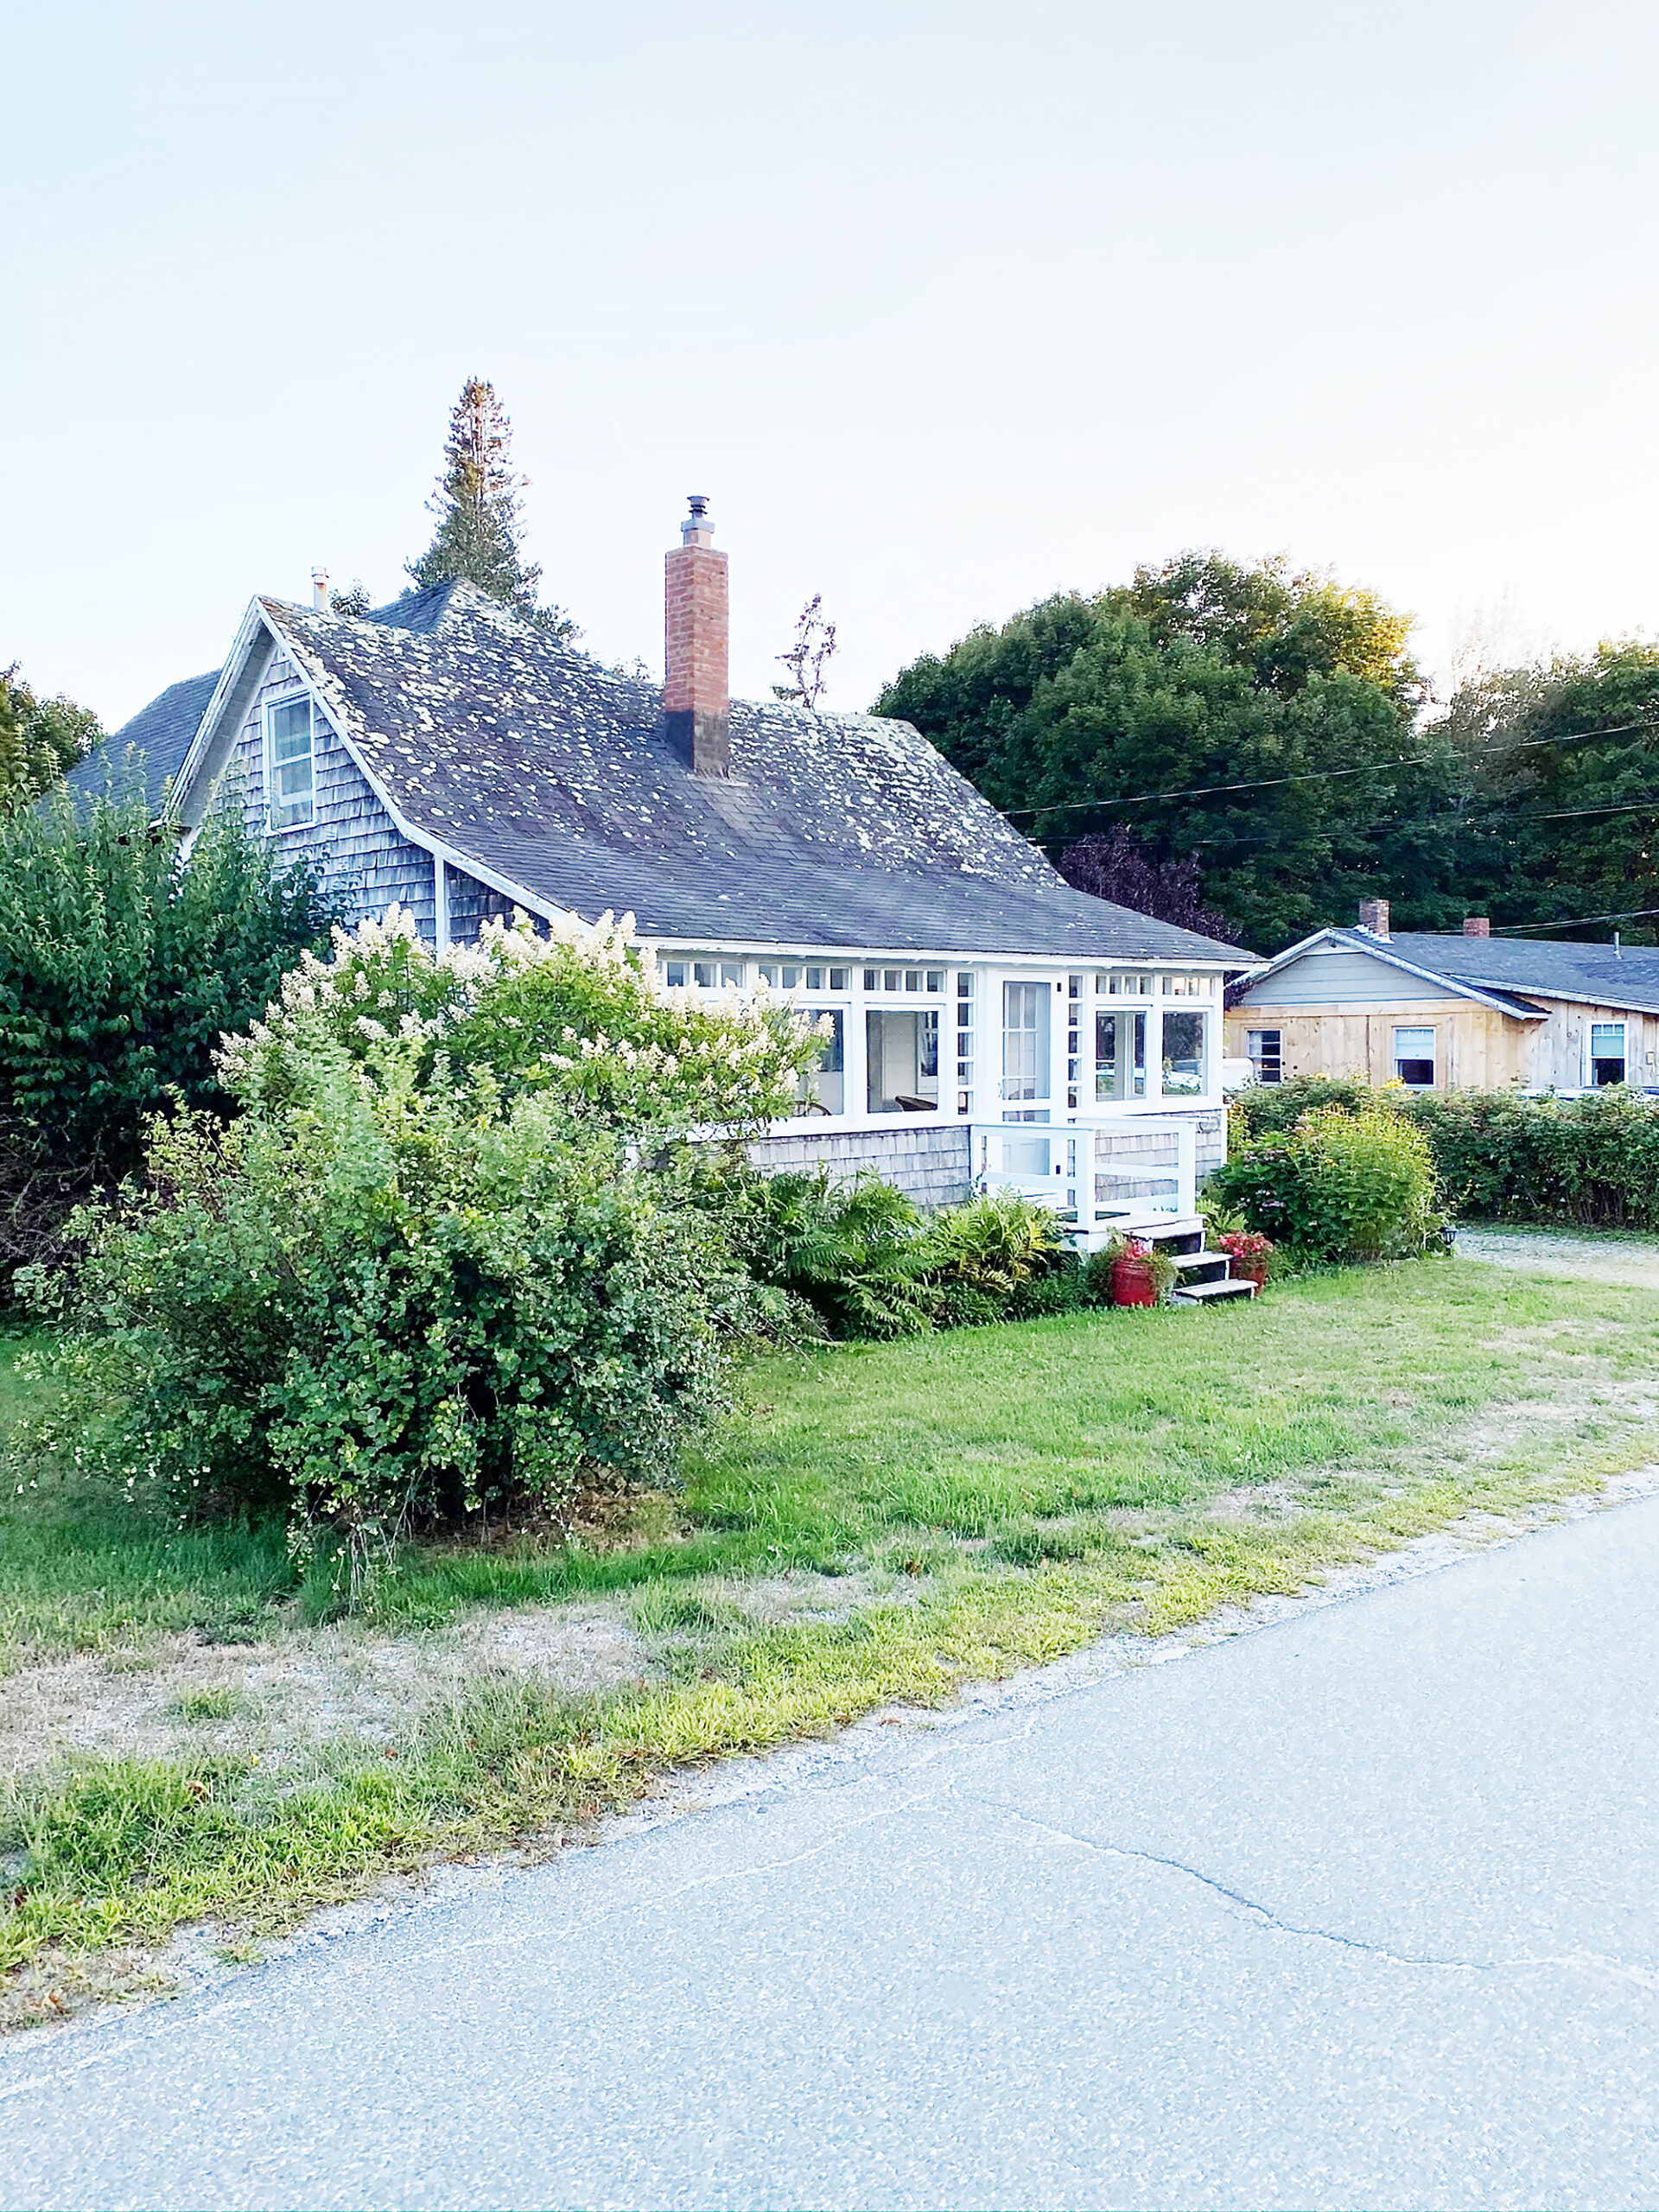 Charming Maine Cottages || DarlingDarleen.com Top Lifestyle CT Blogger Darling Darleen #acadia #acadianationalpark